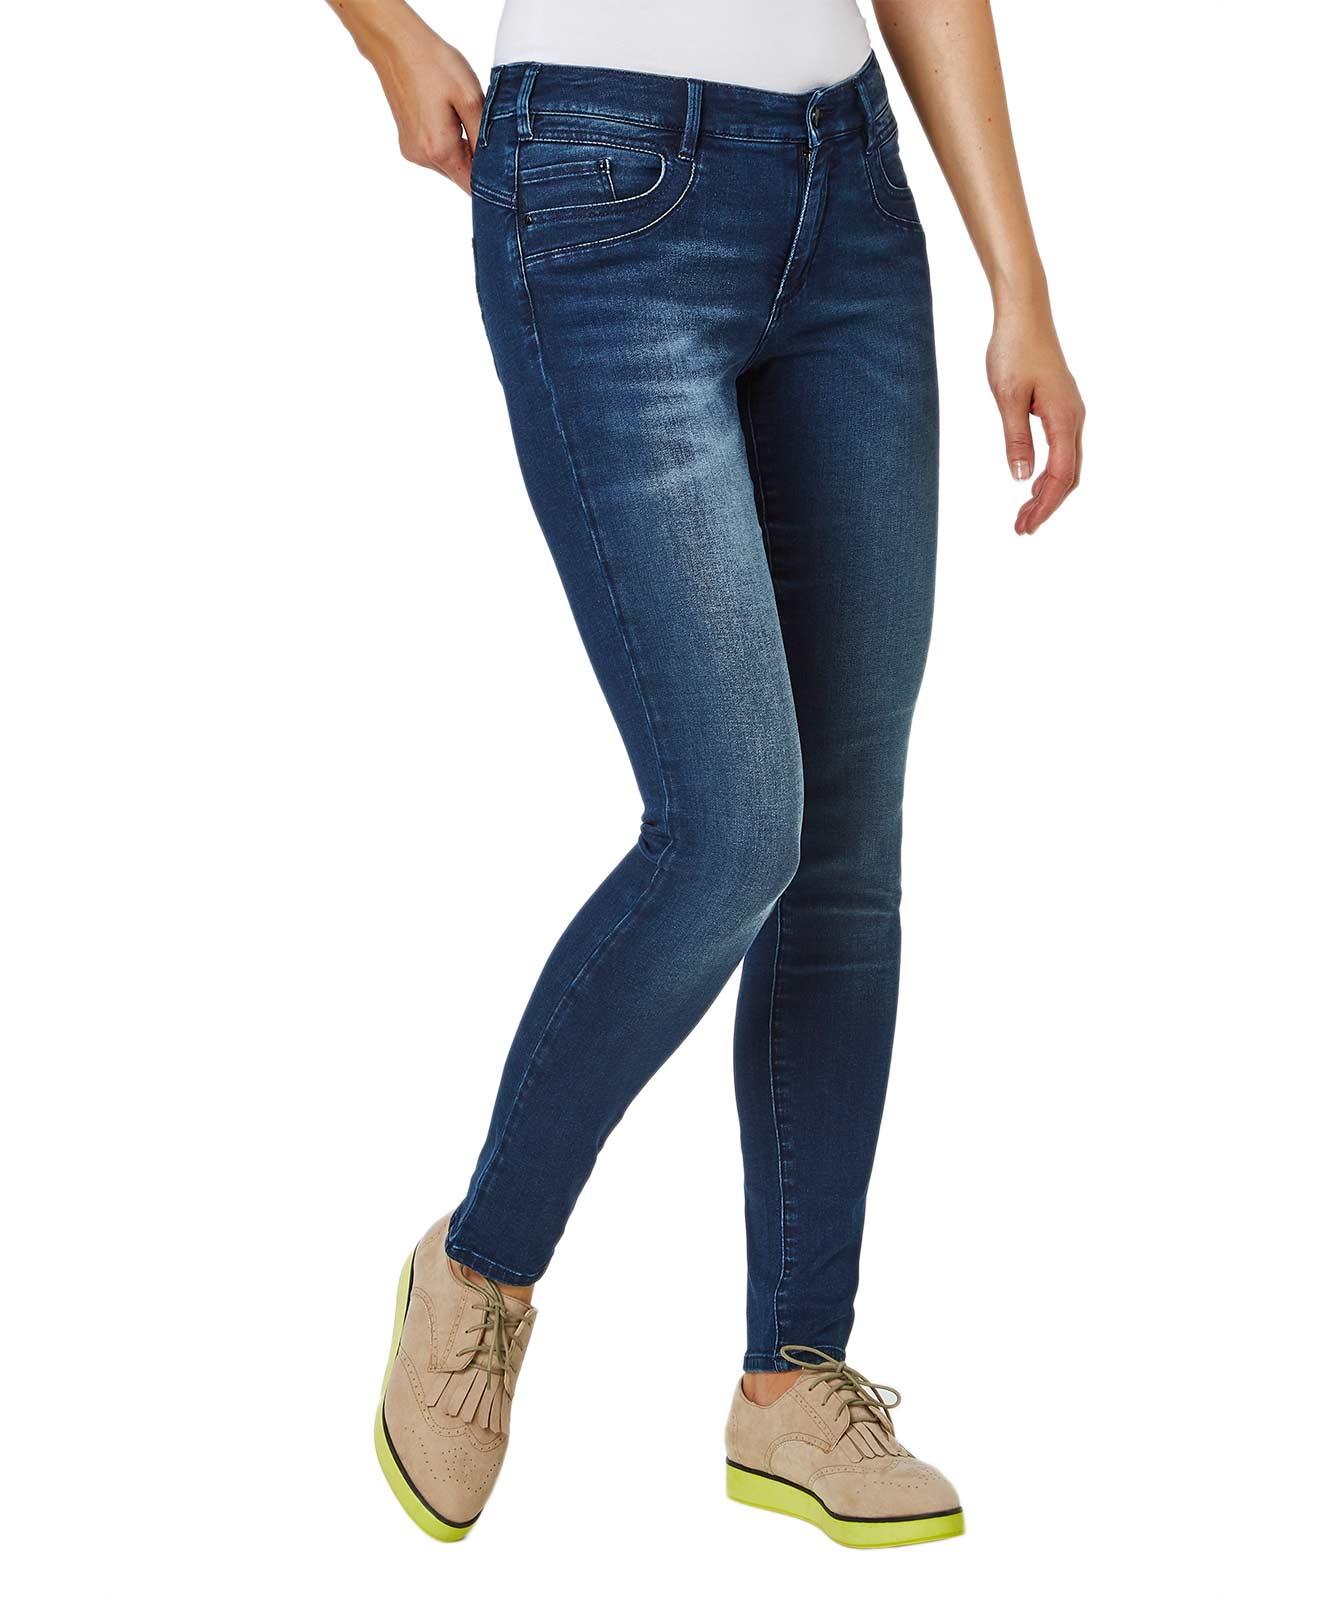 Hosen - Paddocks Jeans Röhre Lucy in Blue Black Stone  - Onlineshop Jeans Meile